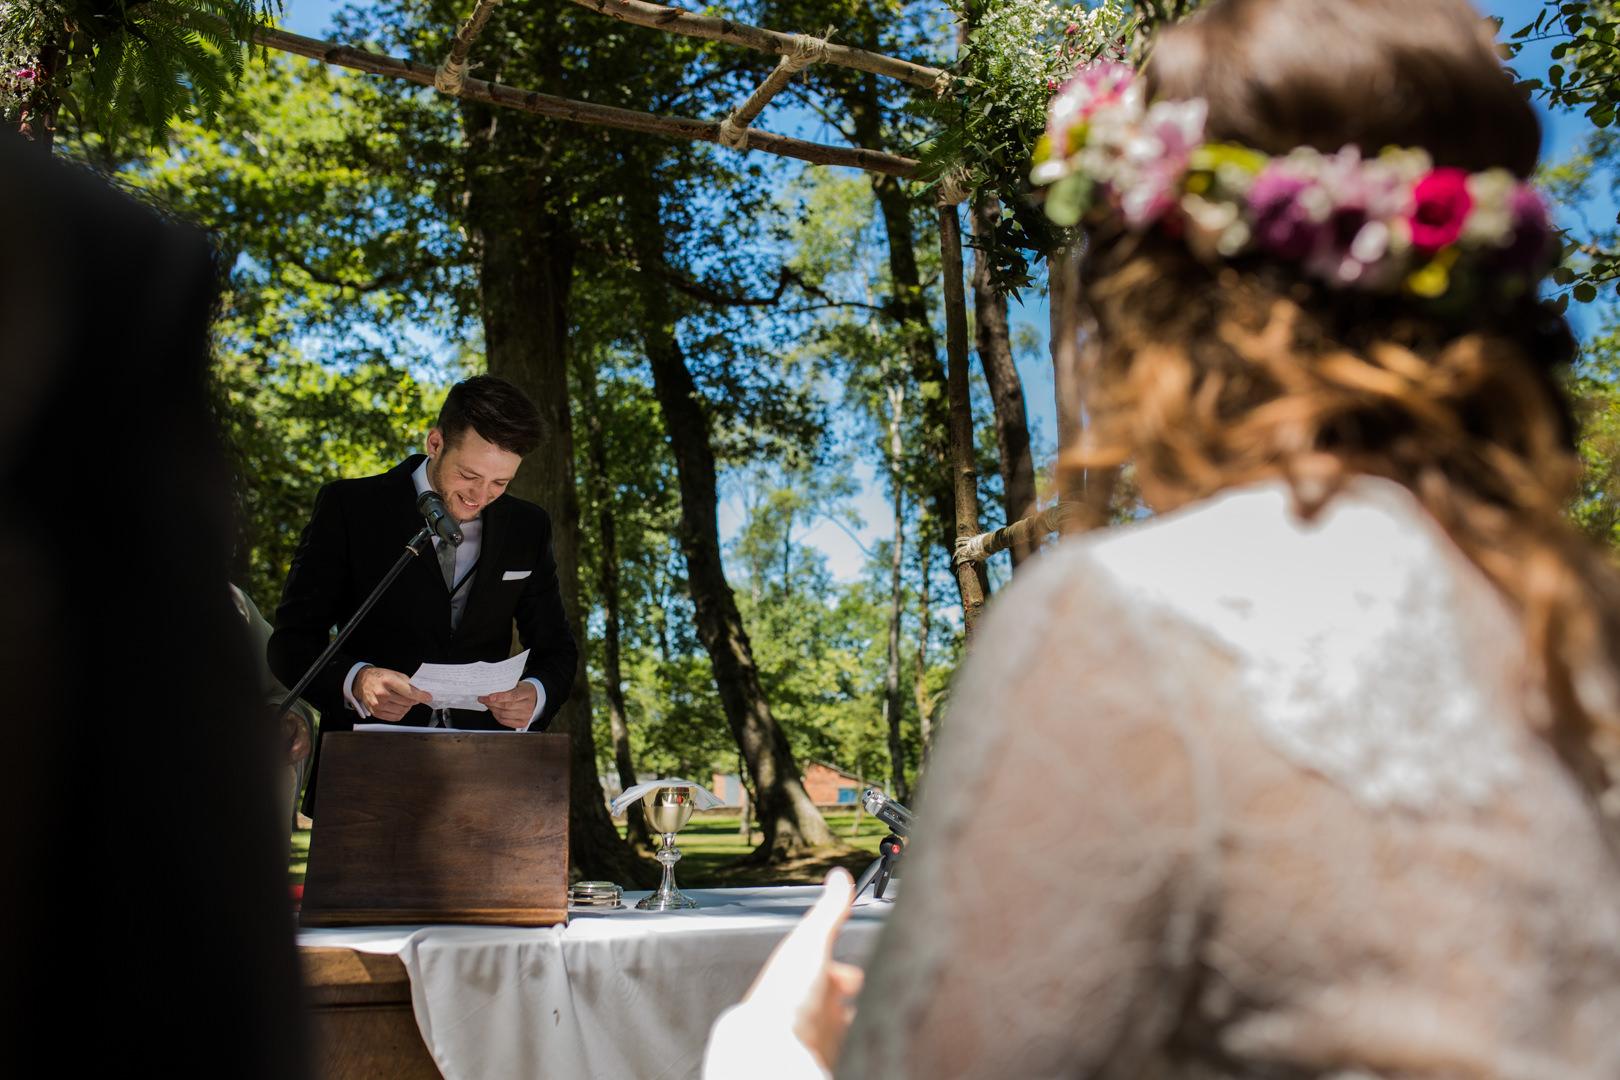 Boda-Lucia-Javi-Lugo-Rafael-Torres-fotografo-bodas-sevilla-madrid-barcelona-wedding-photographer--25.jpg